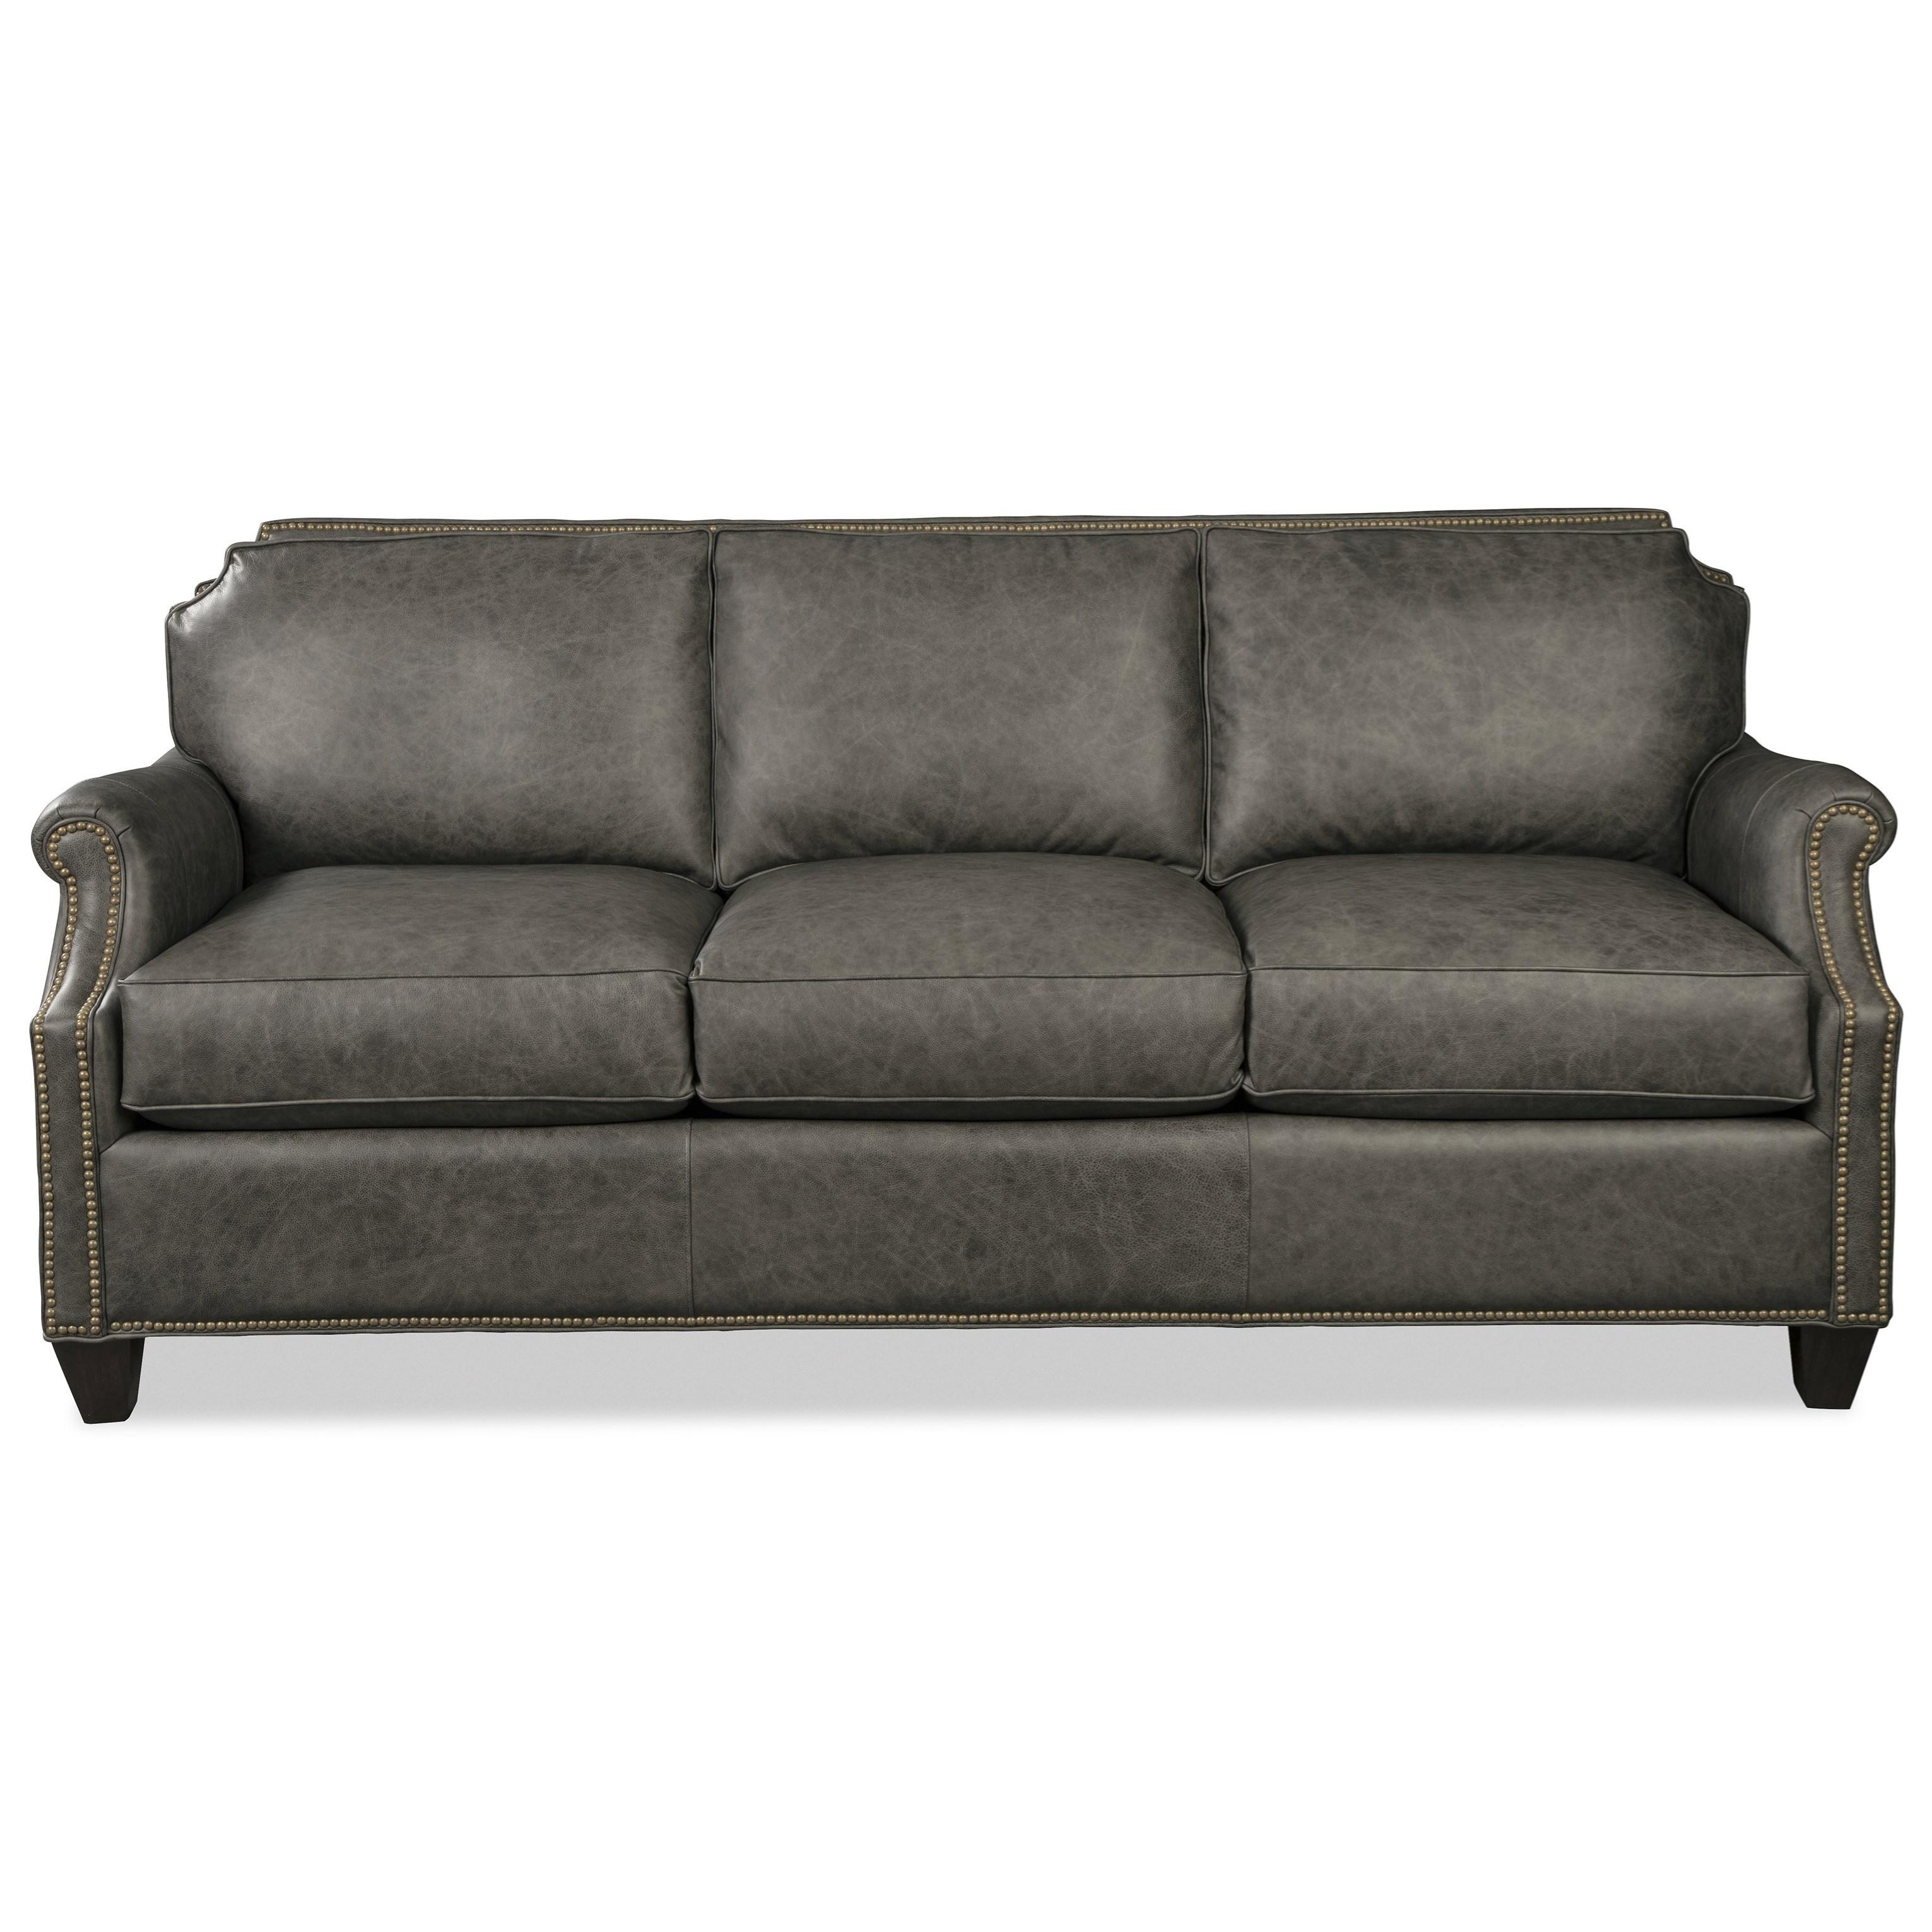 L738350 Sofa by Craftmaster at Bullard Furniture